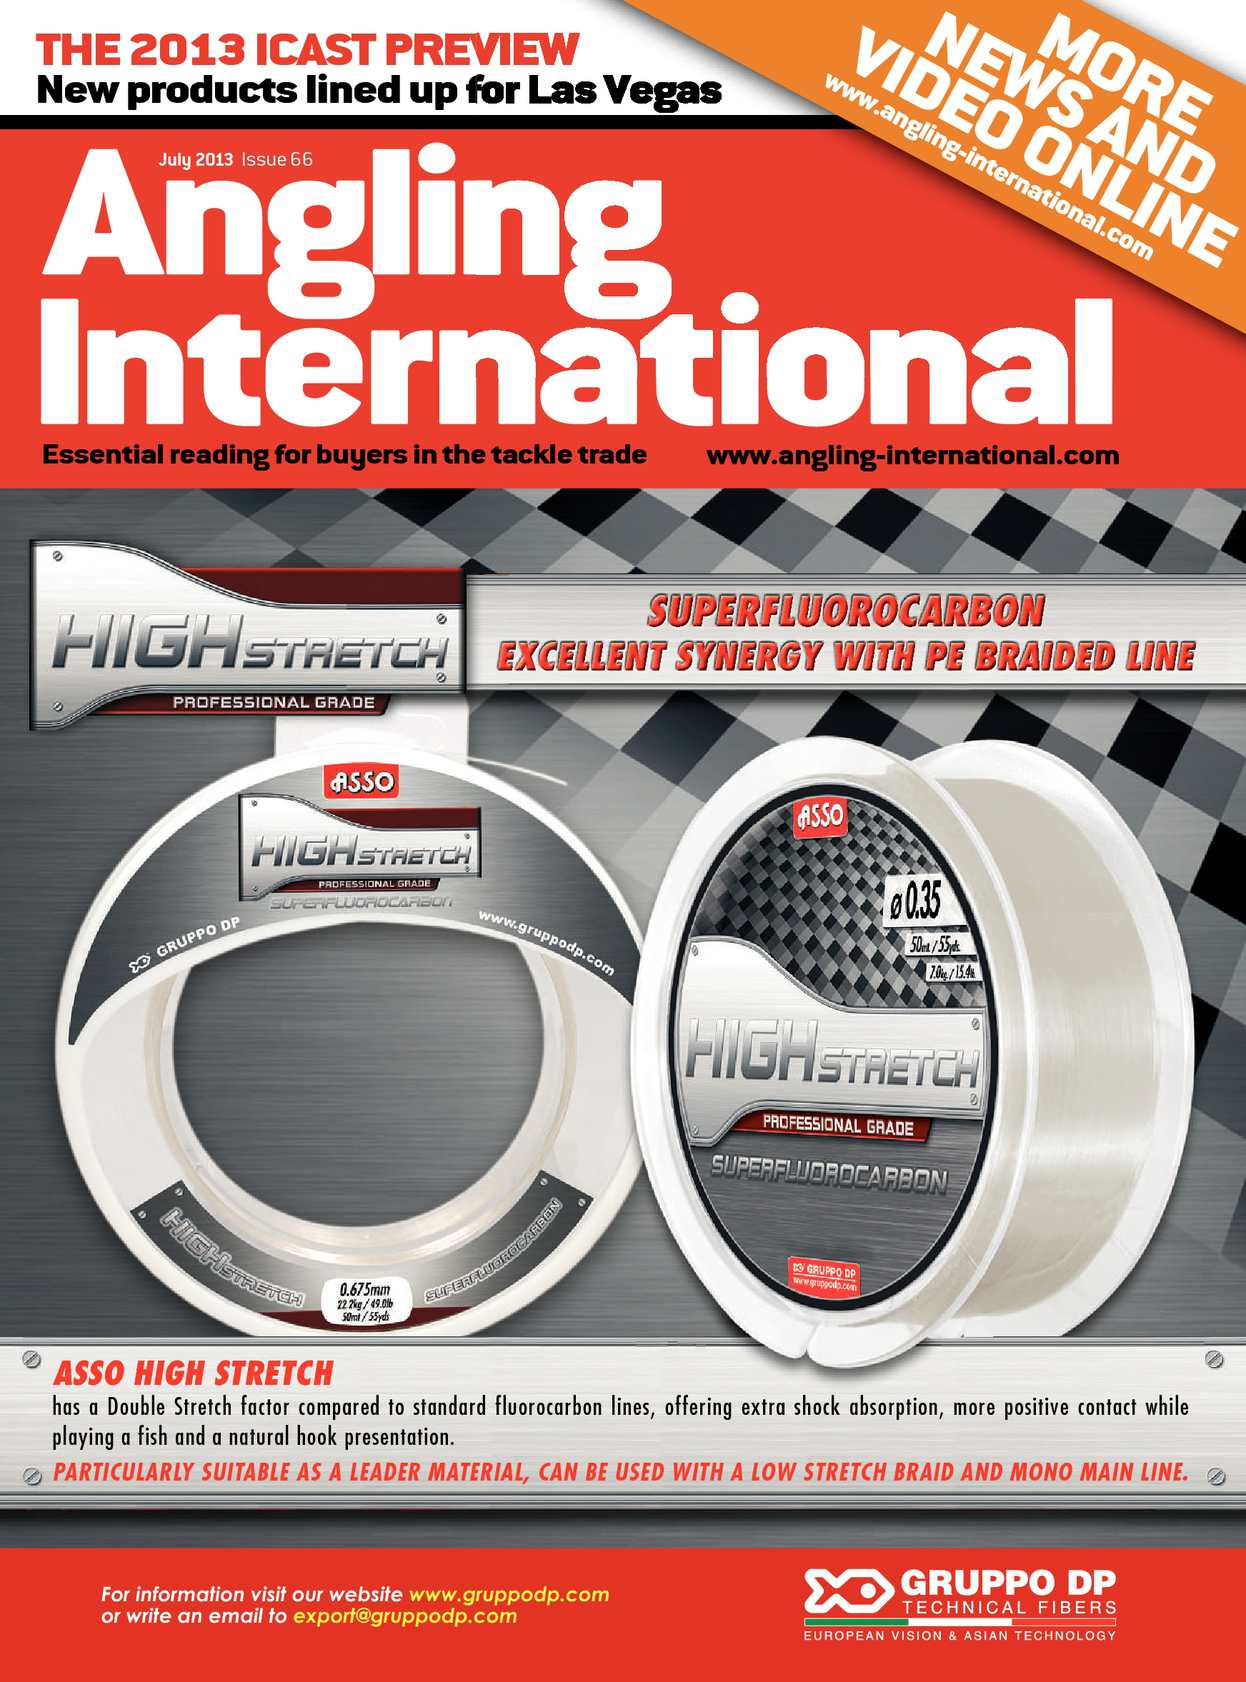 b273a2f62a Calaméo - Angling International - July 2013 - Issue 66